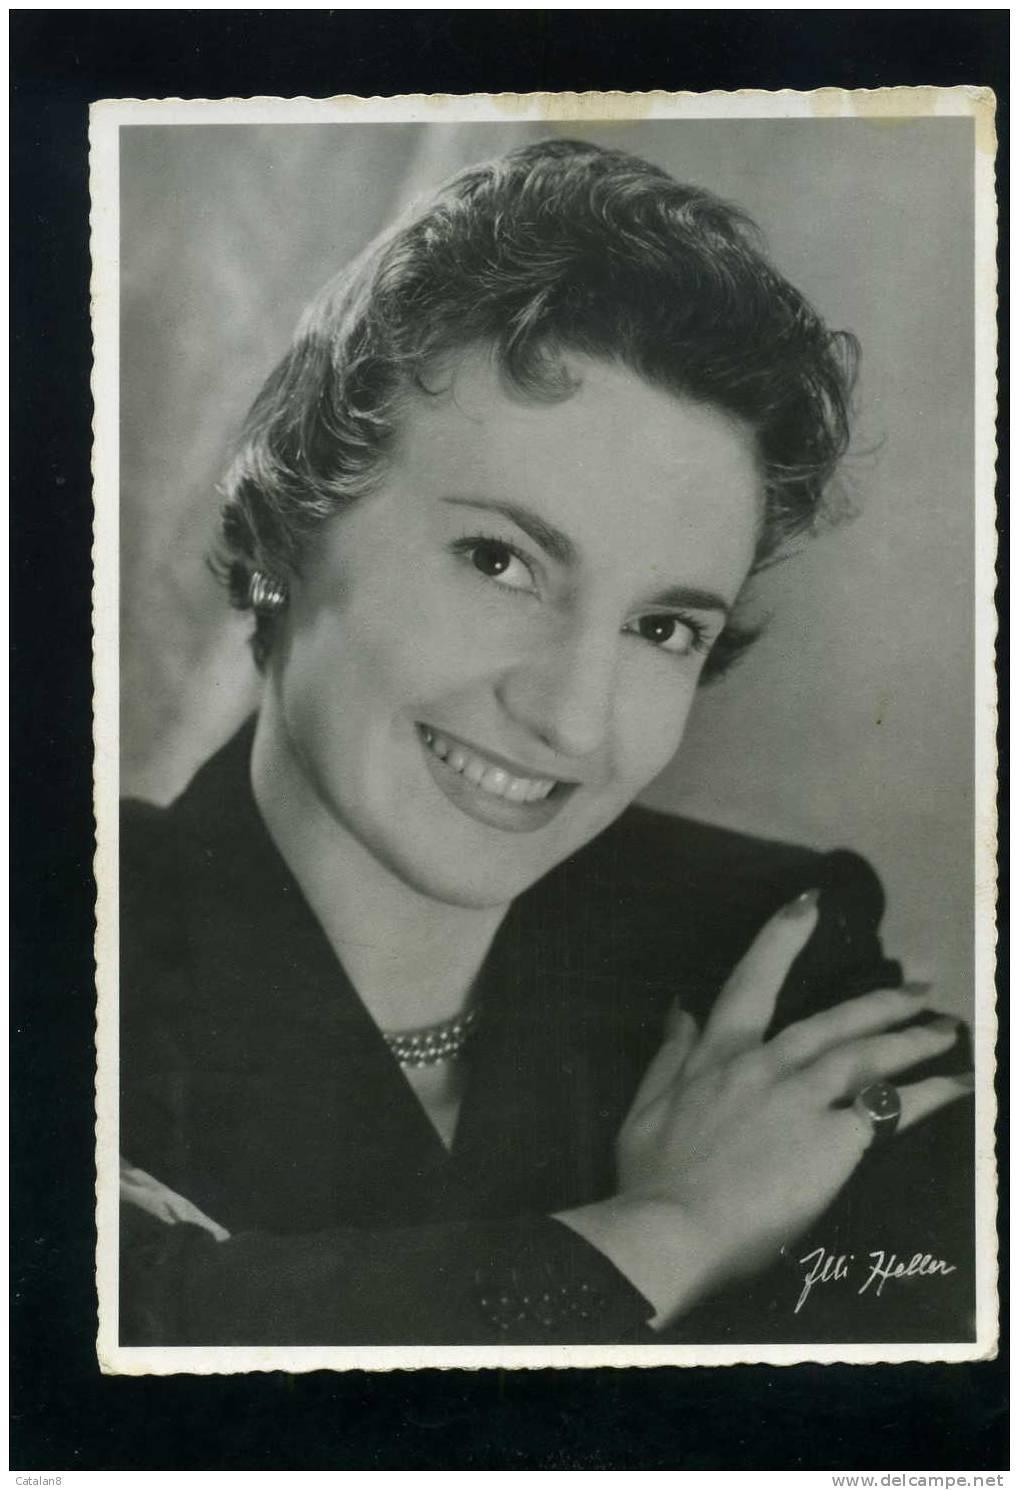 picture Carla Abellana (b. 1986)